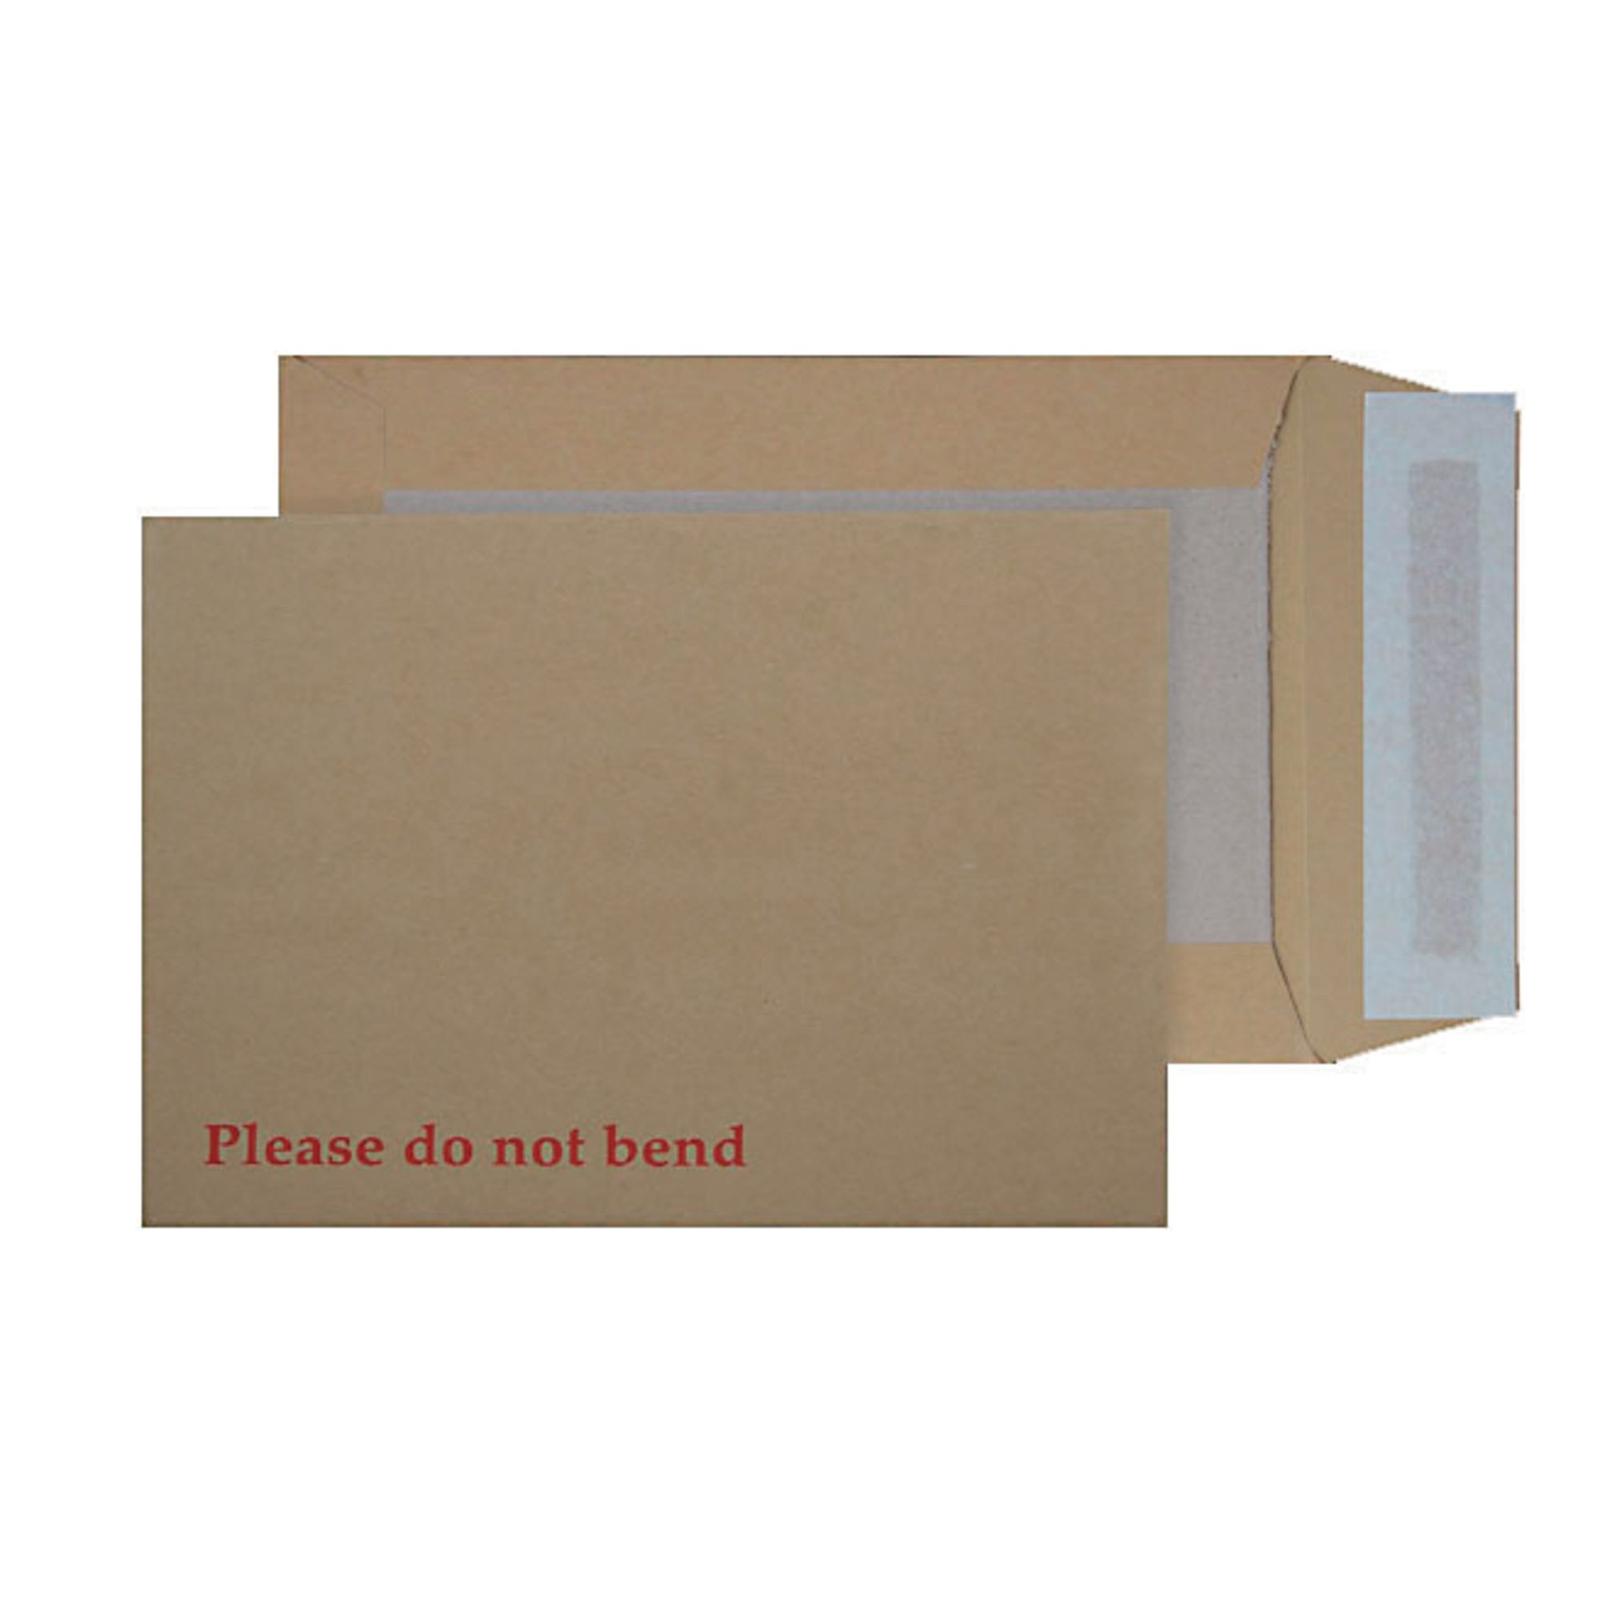 C4 Manilla Peel 'n' Stick Flap Envelopes - Box of 125